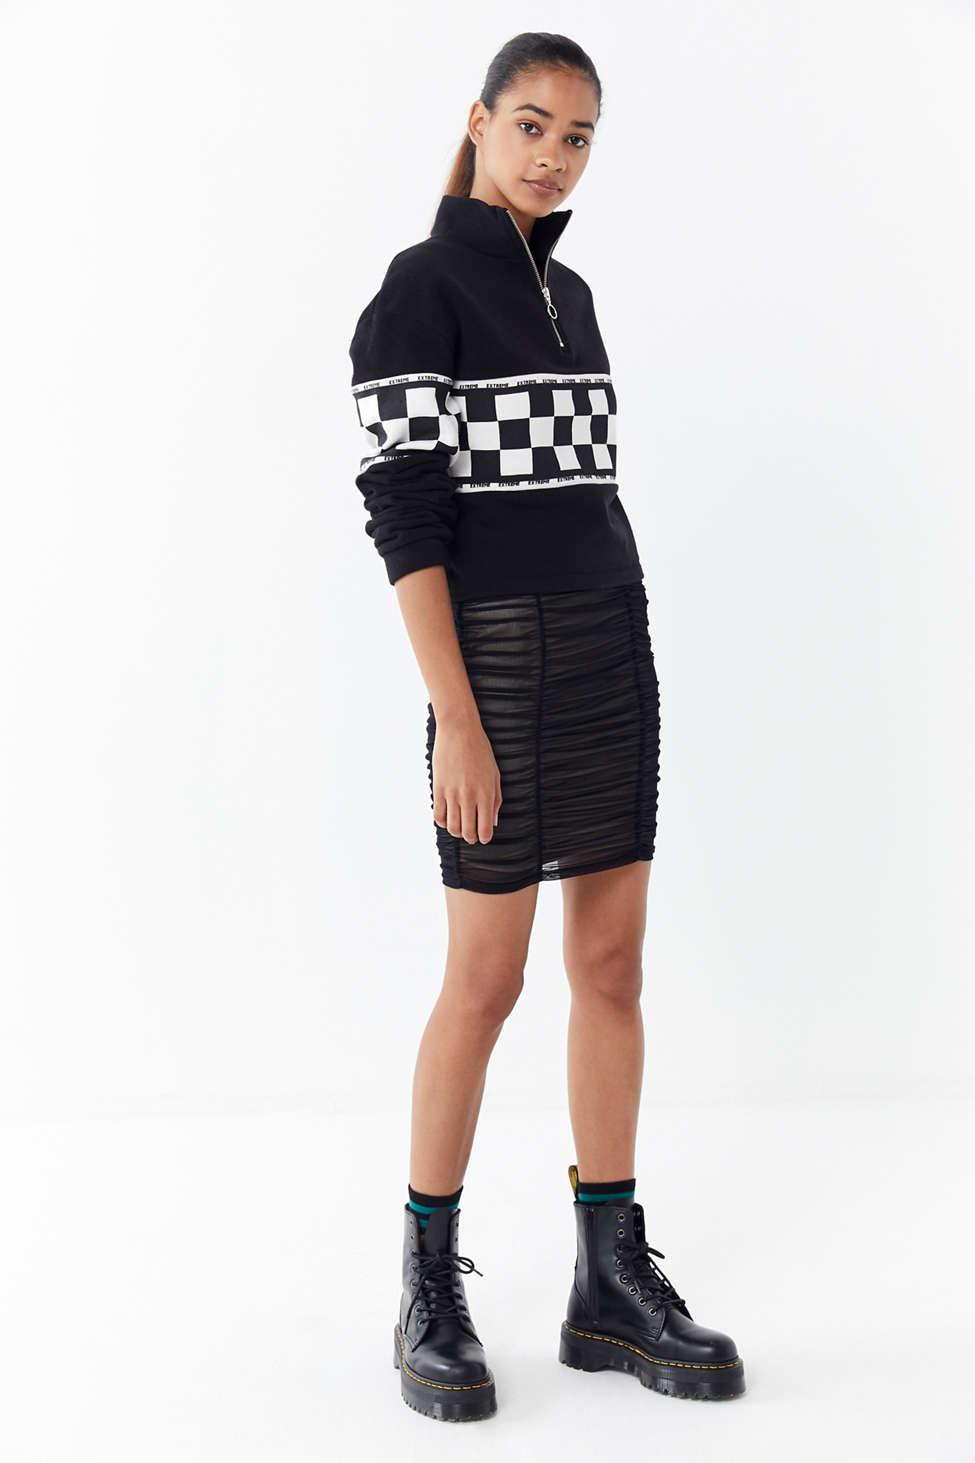 3fbc2e7acc8 Urban Outfitters - Black Uo Della Mesh Ruched Mini Skirt - Lyst. View  fullscreen